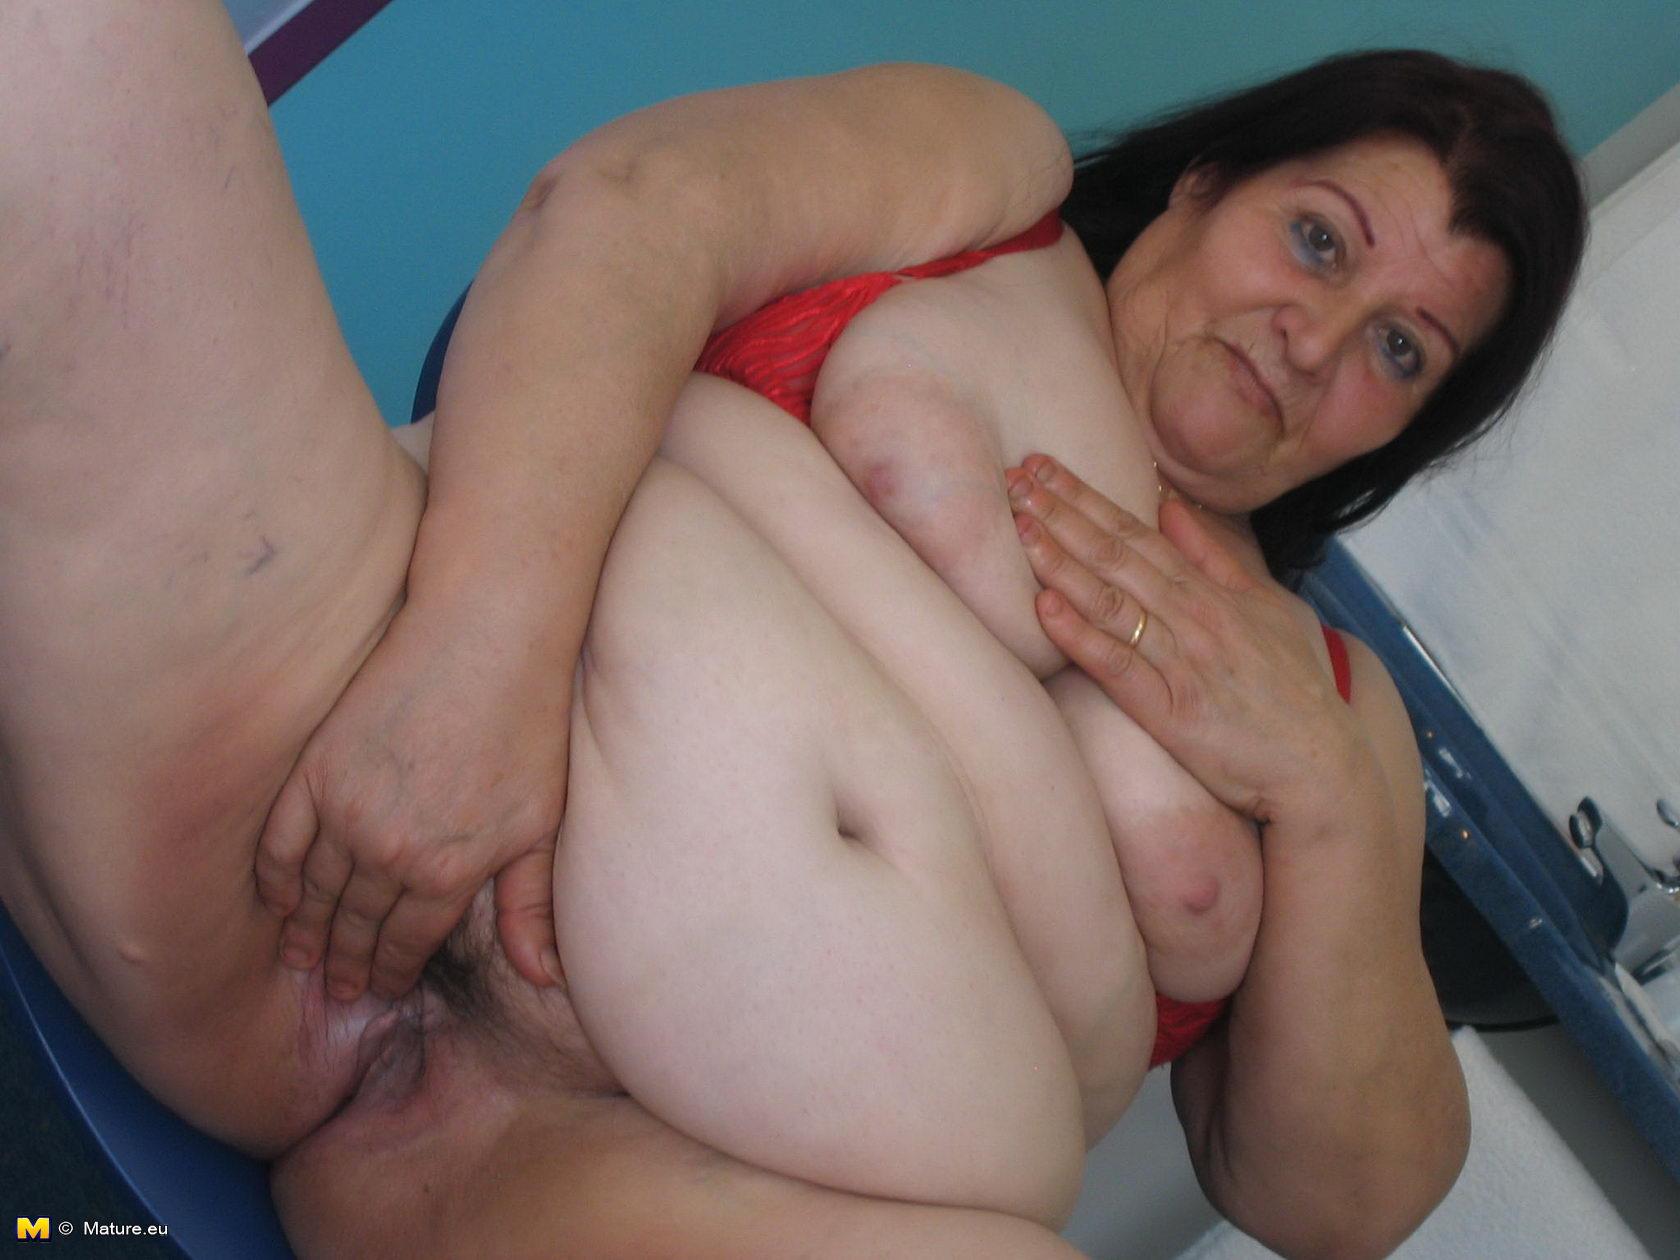 Секс бабушек с большим клитором